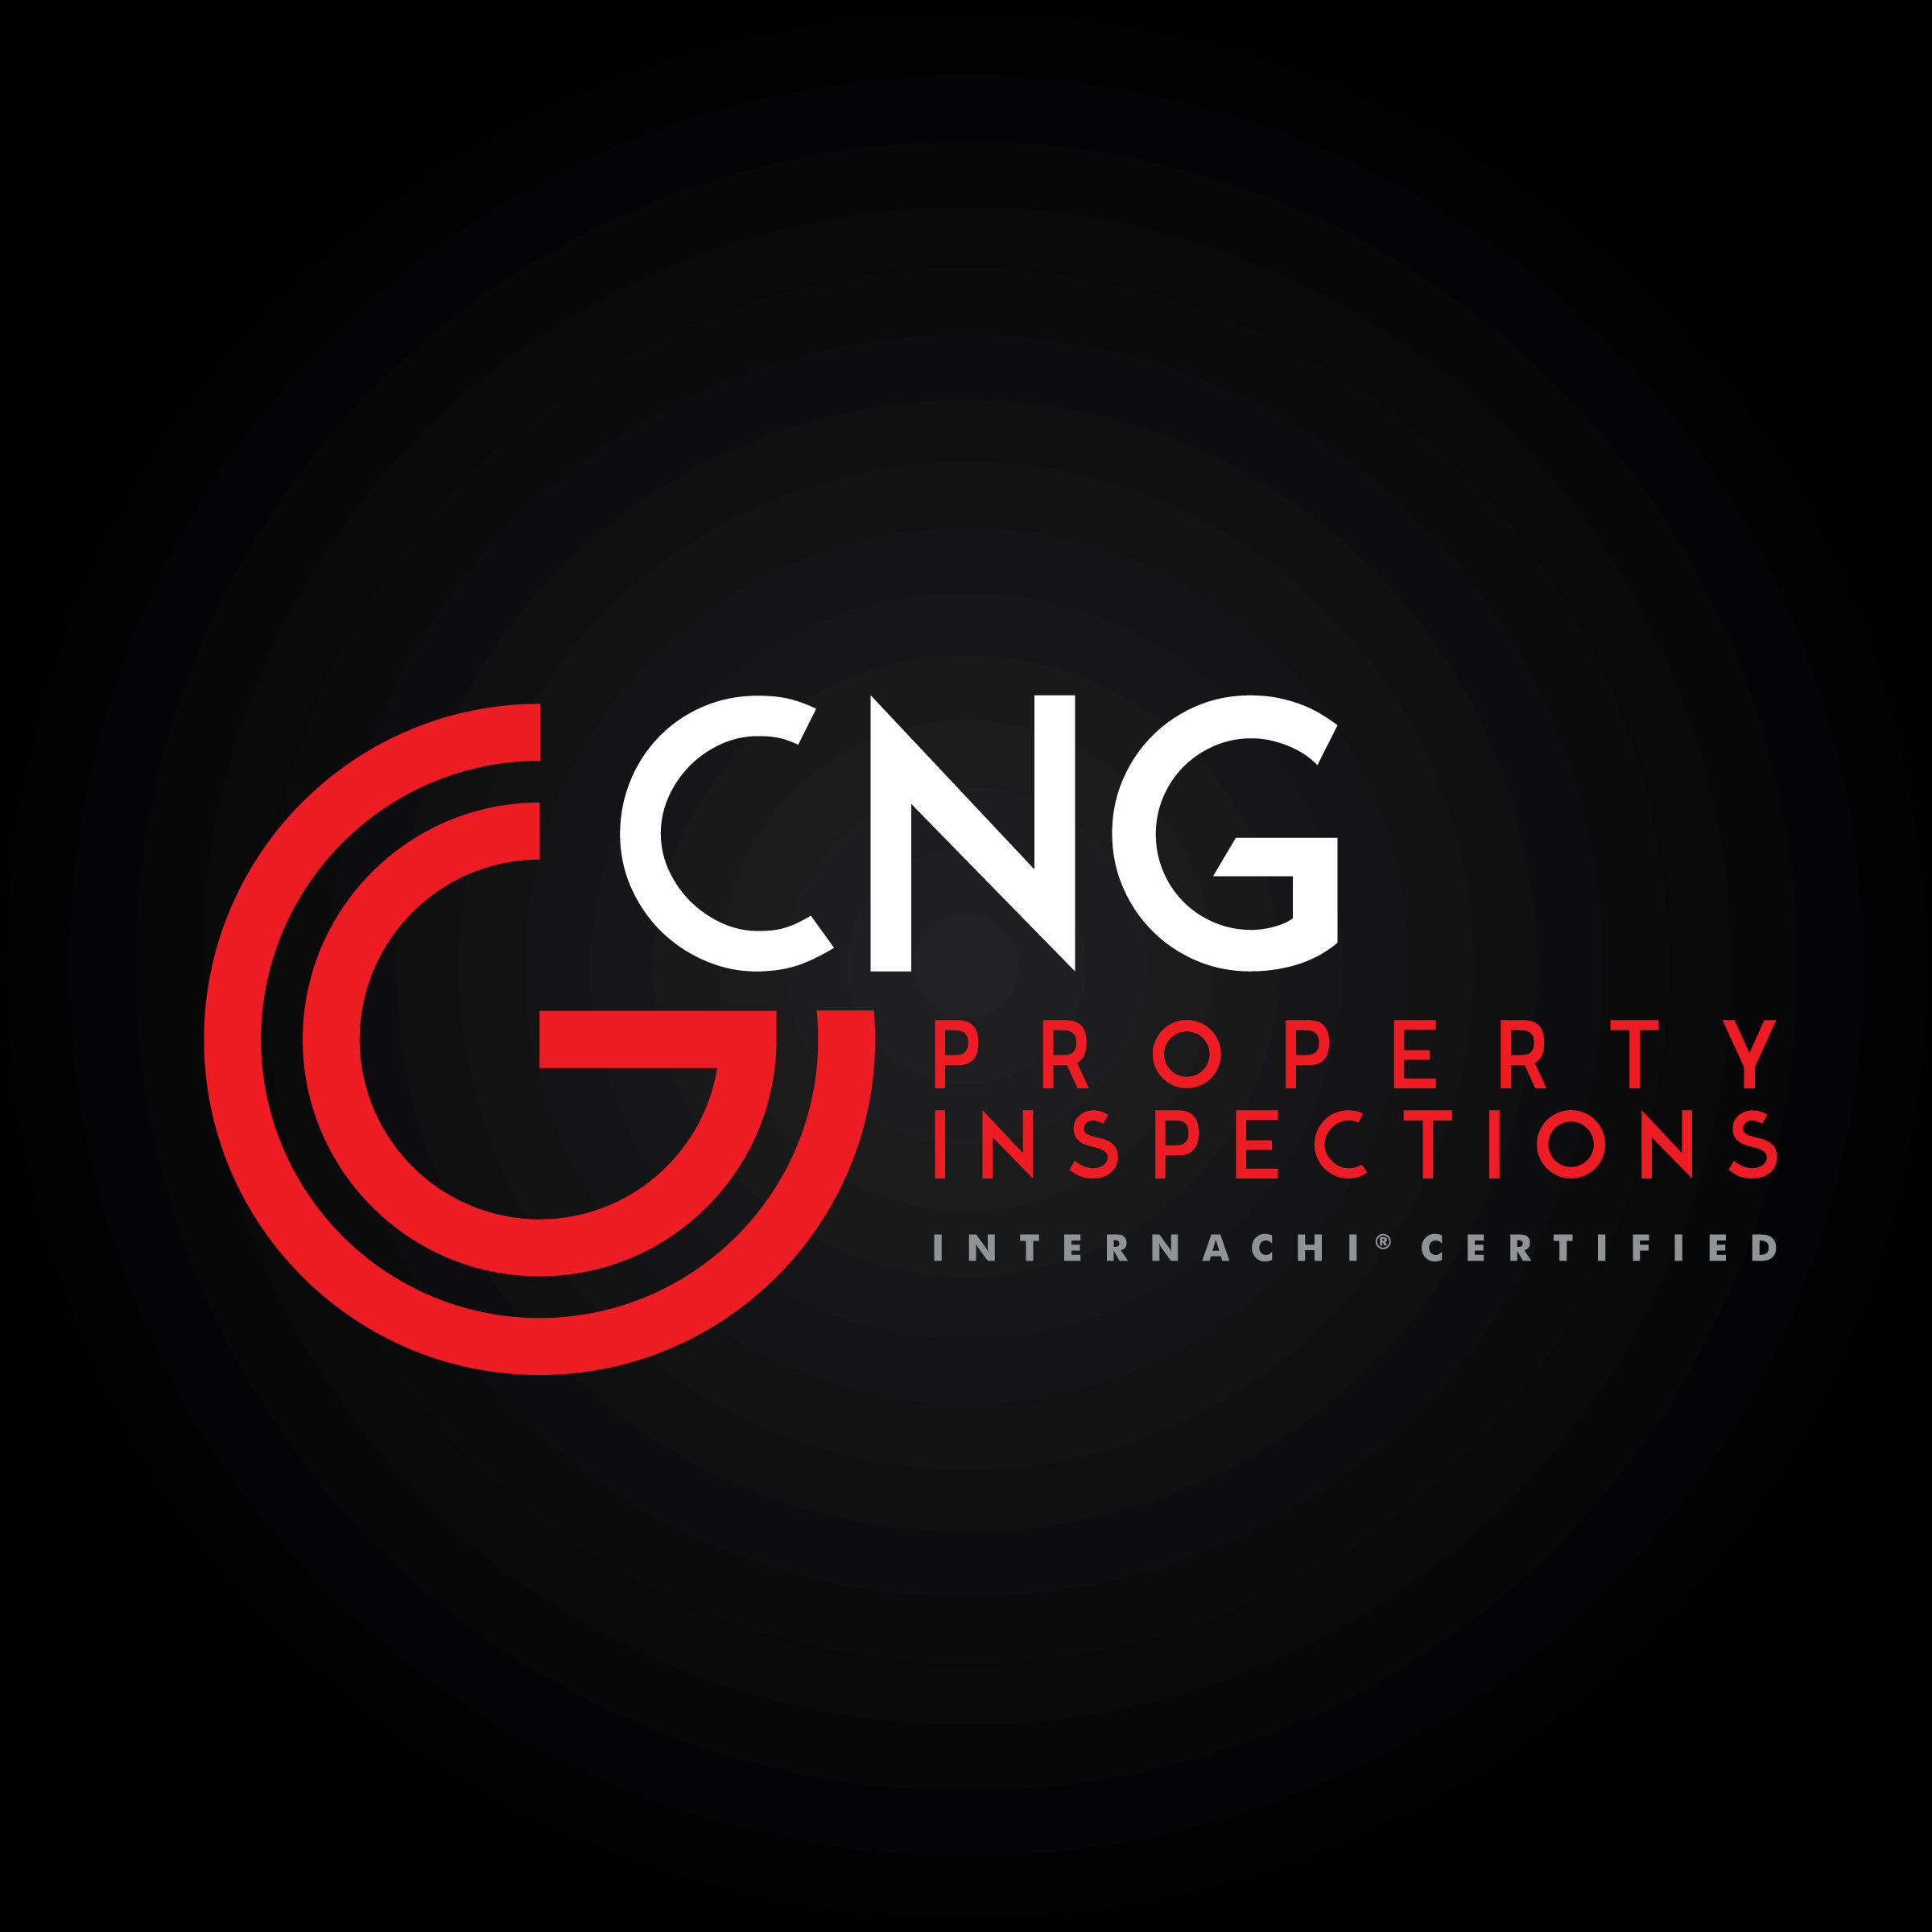 Cng logo jpeg